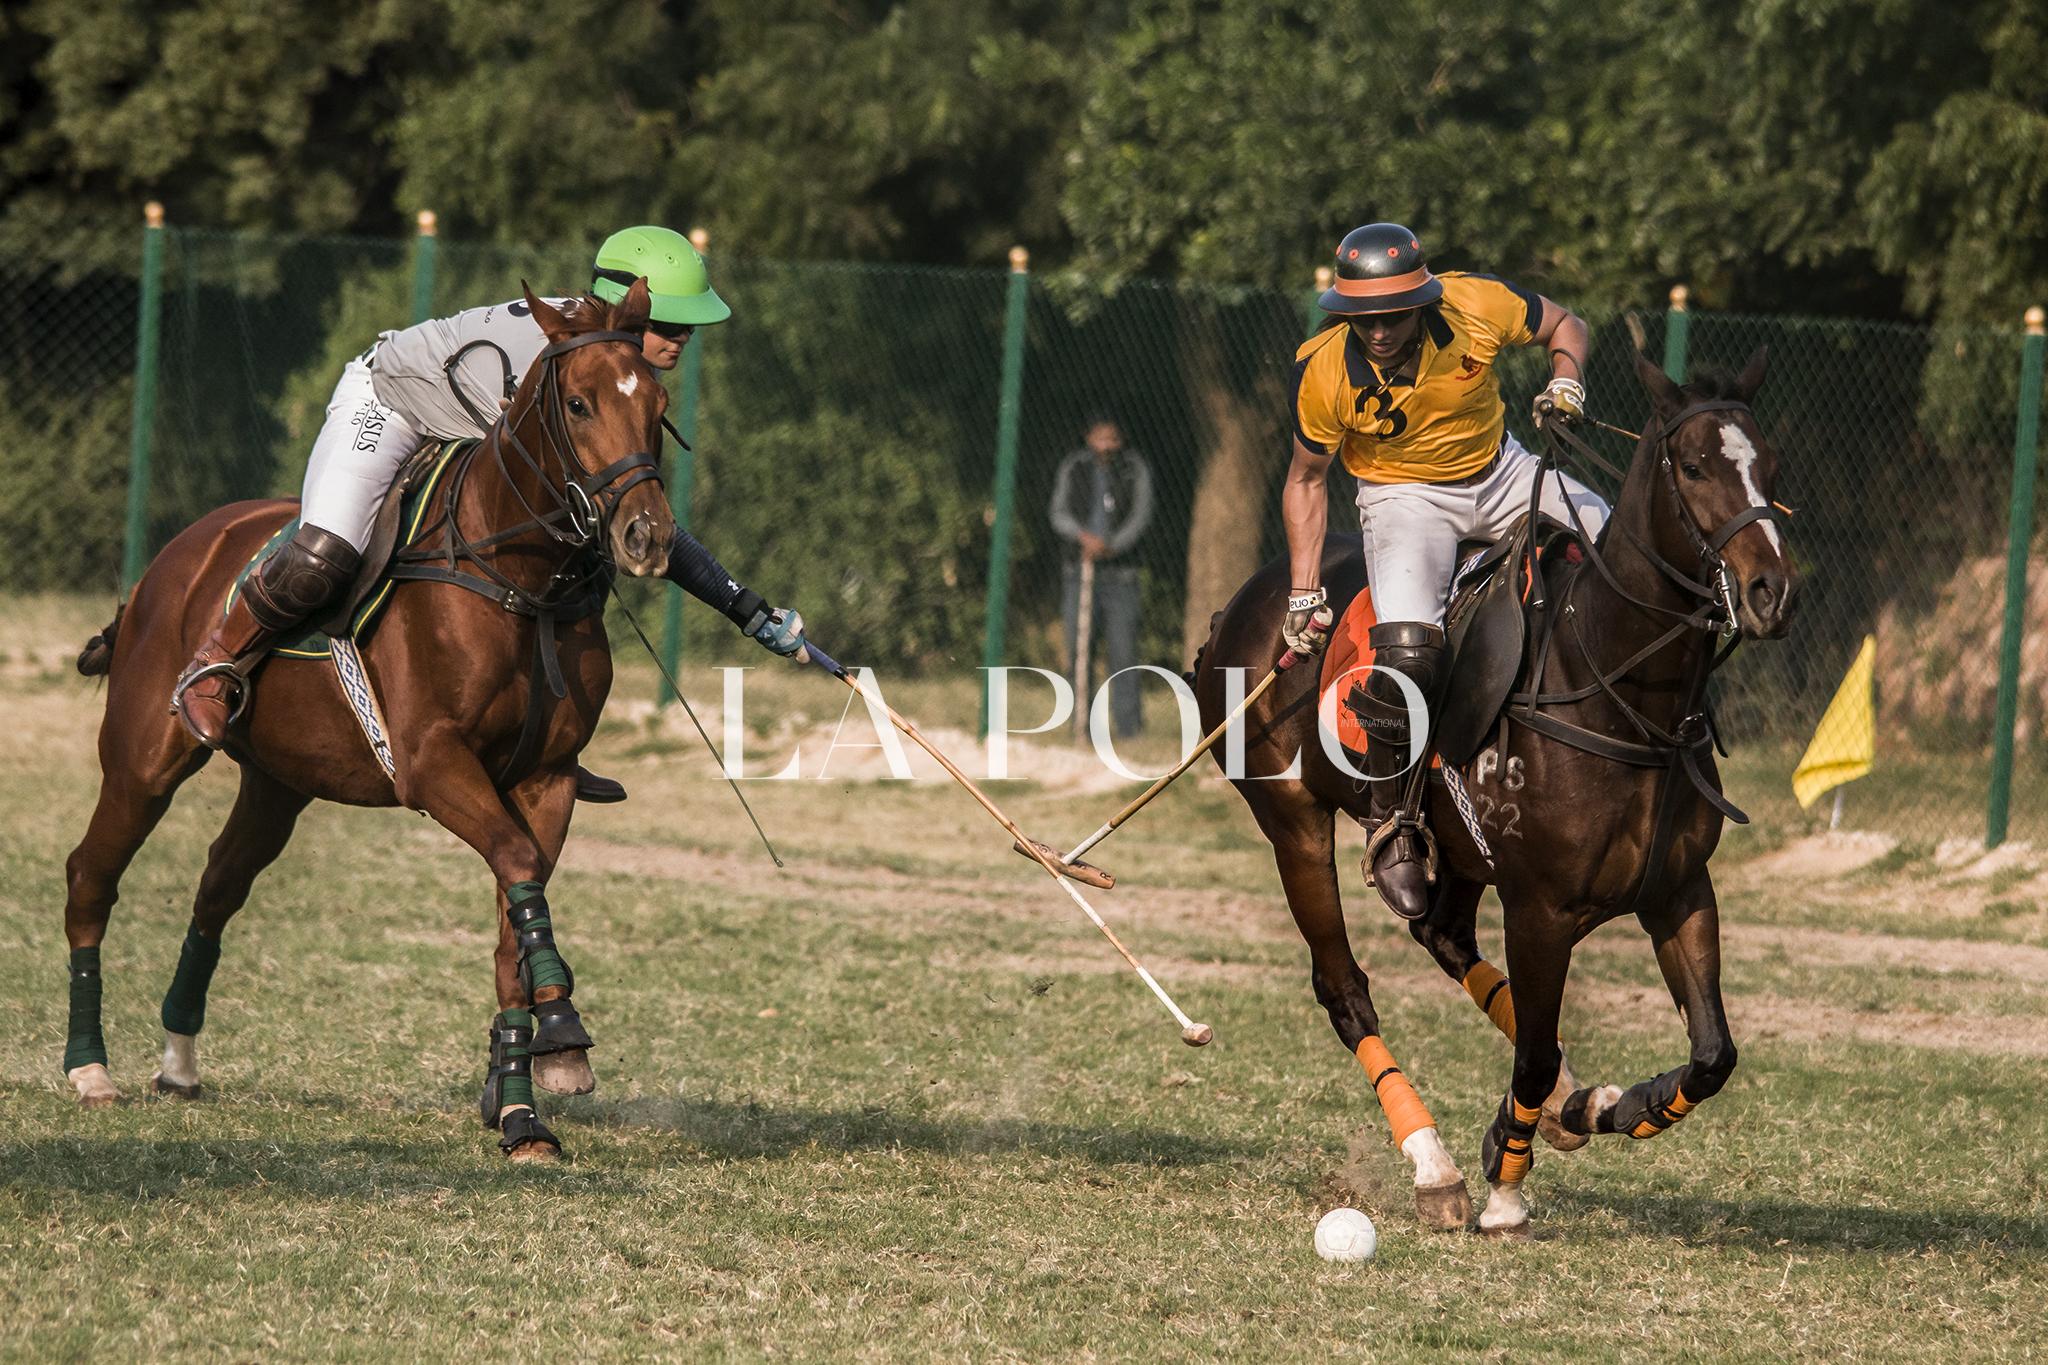 jodhpur-polo-season-lapolo